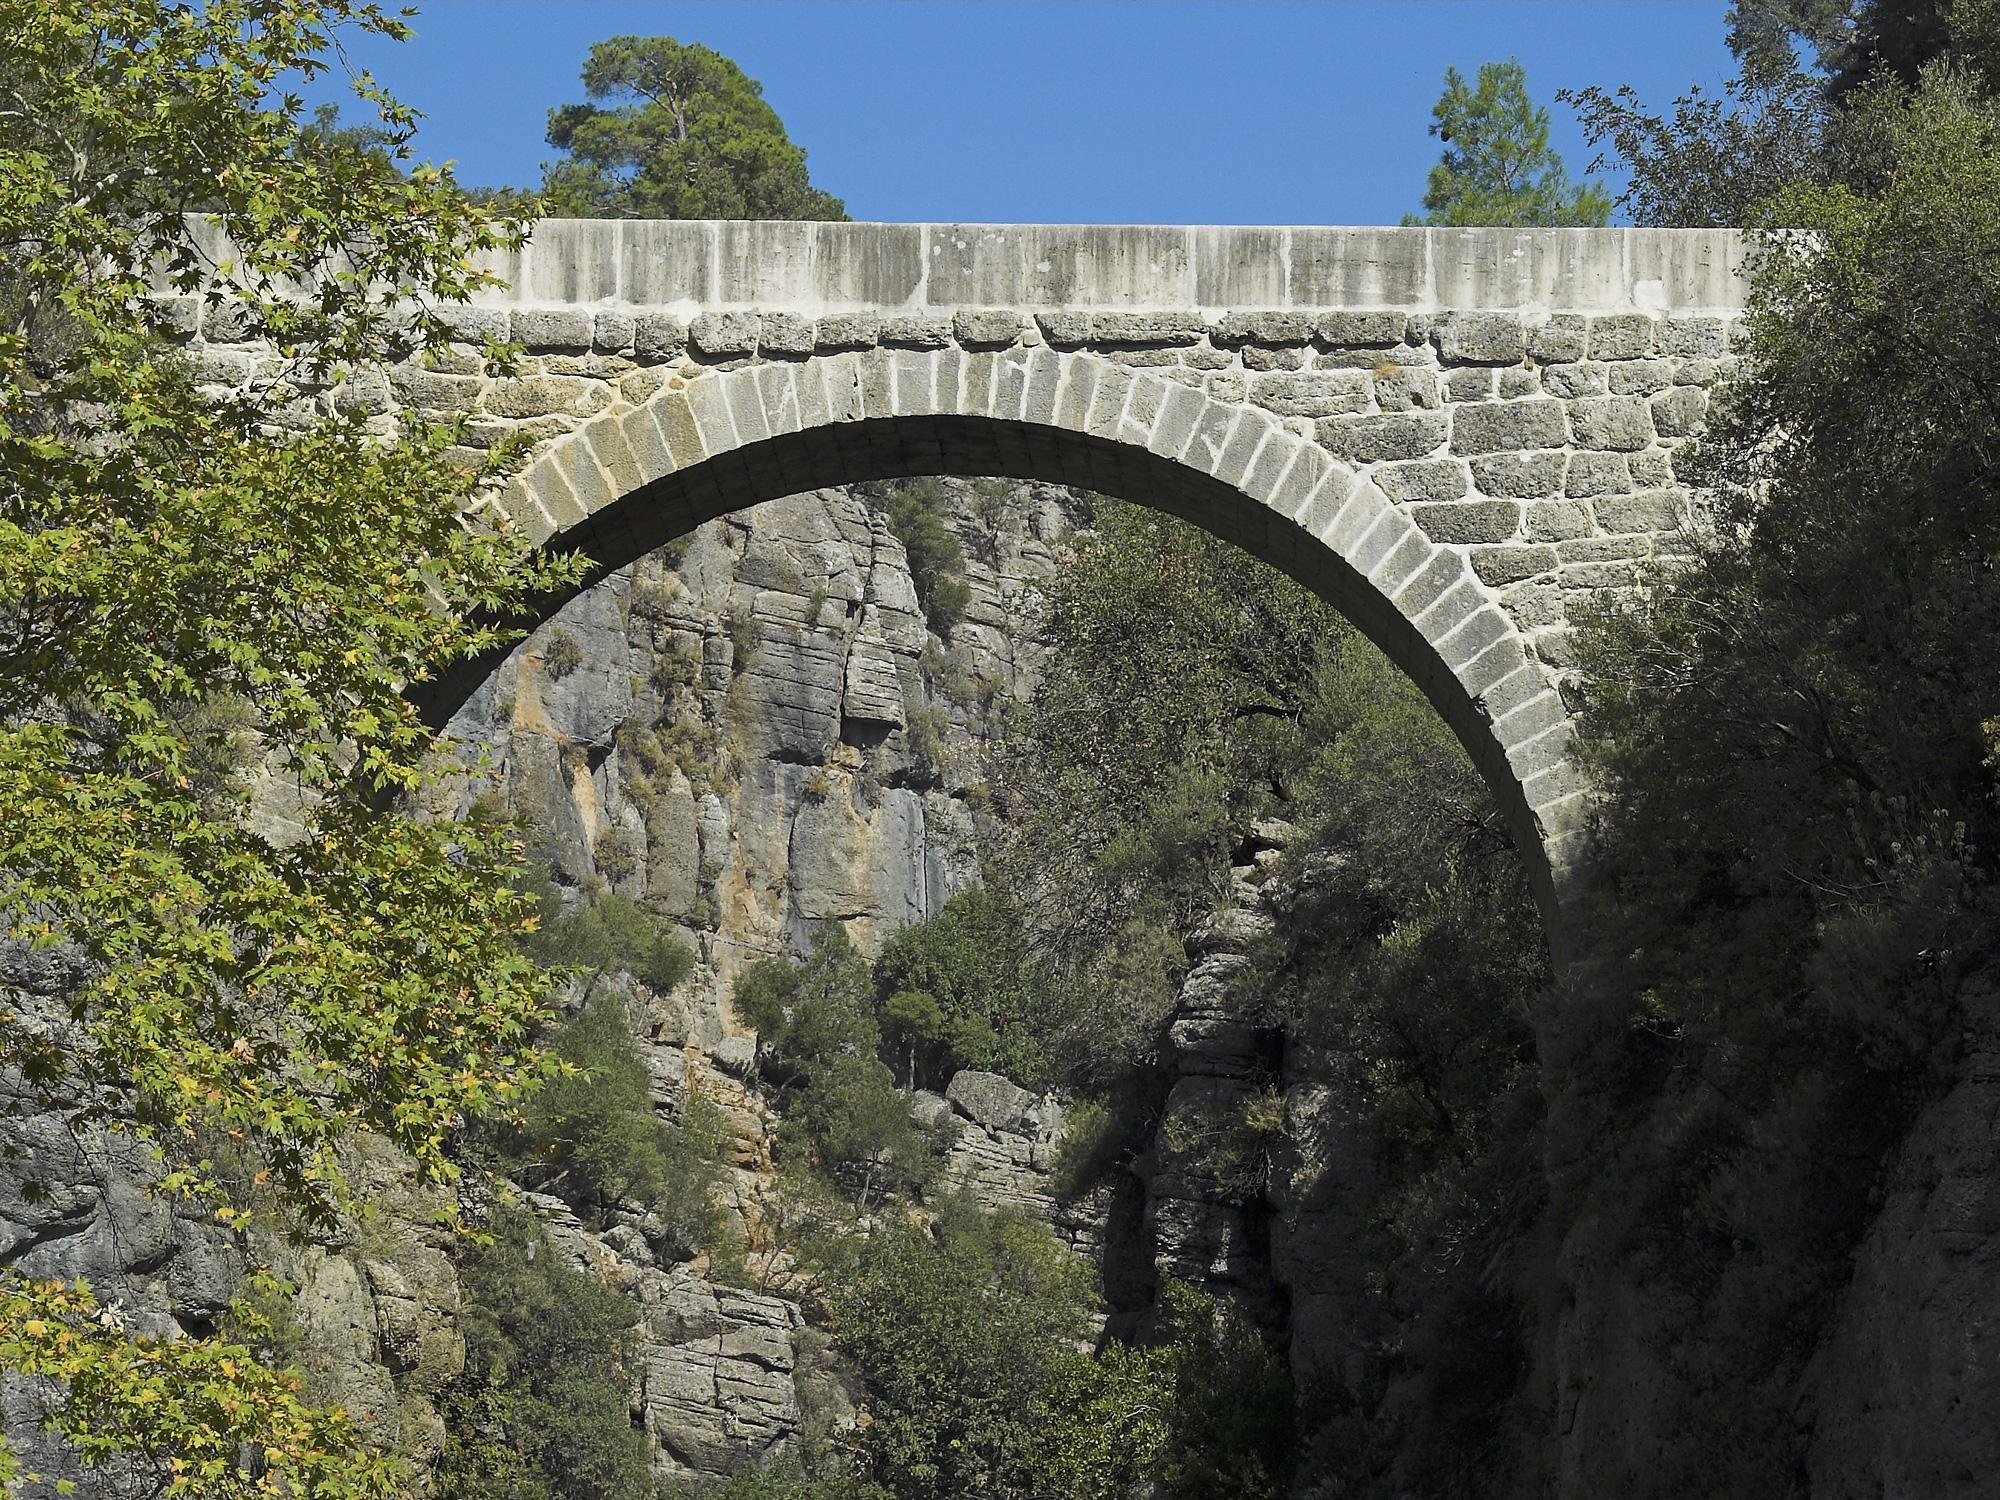 File:Eurymedon Bridge, Selge, Turkey. Pic 06.jpg ...